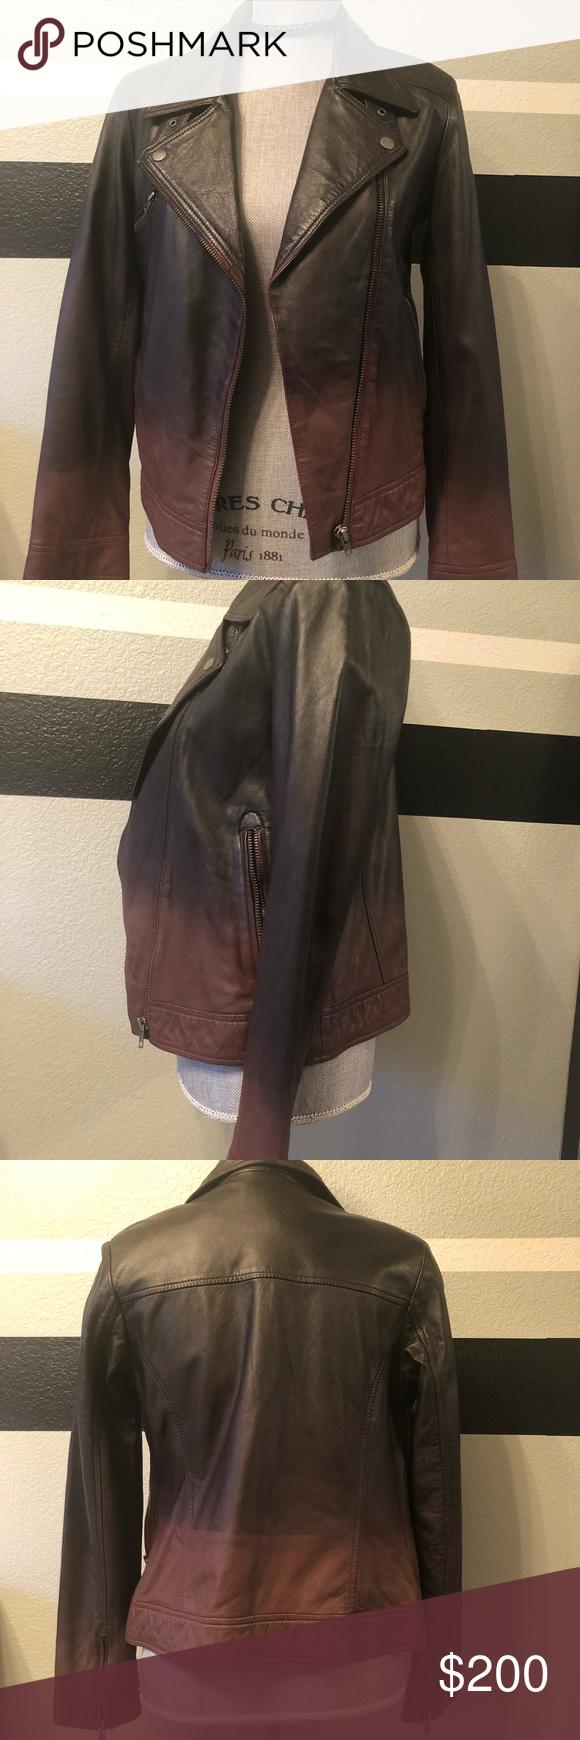 100 genuine leather ombré jacket ! Ombre jackets